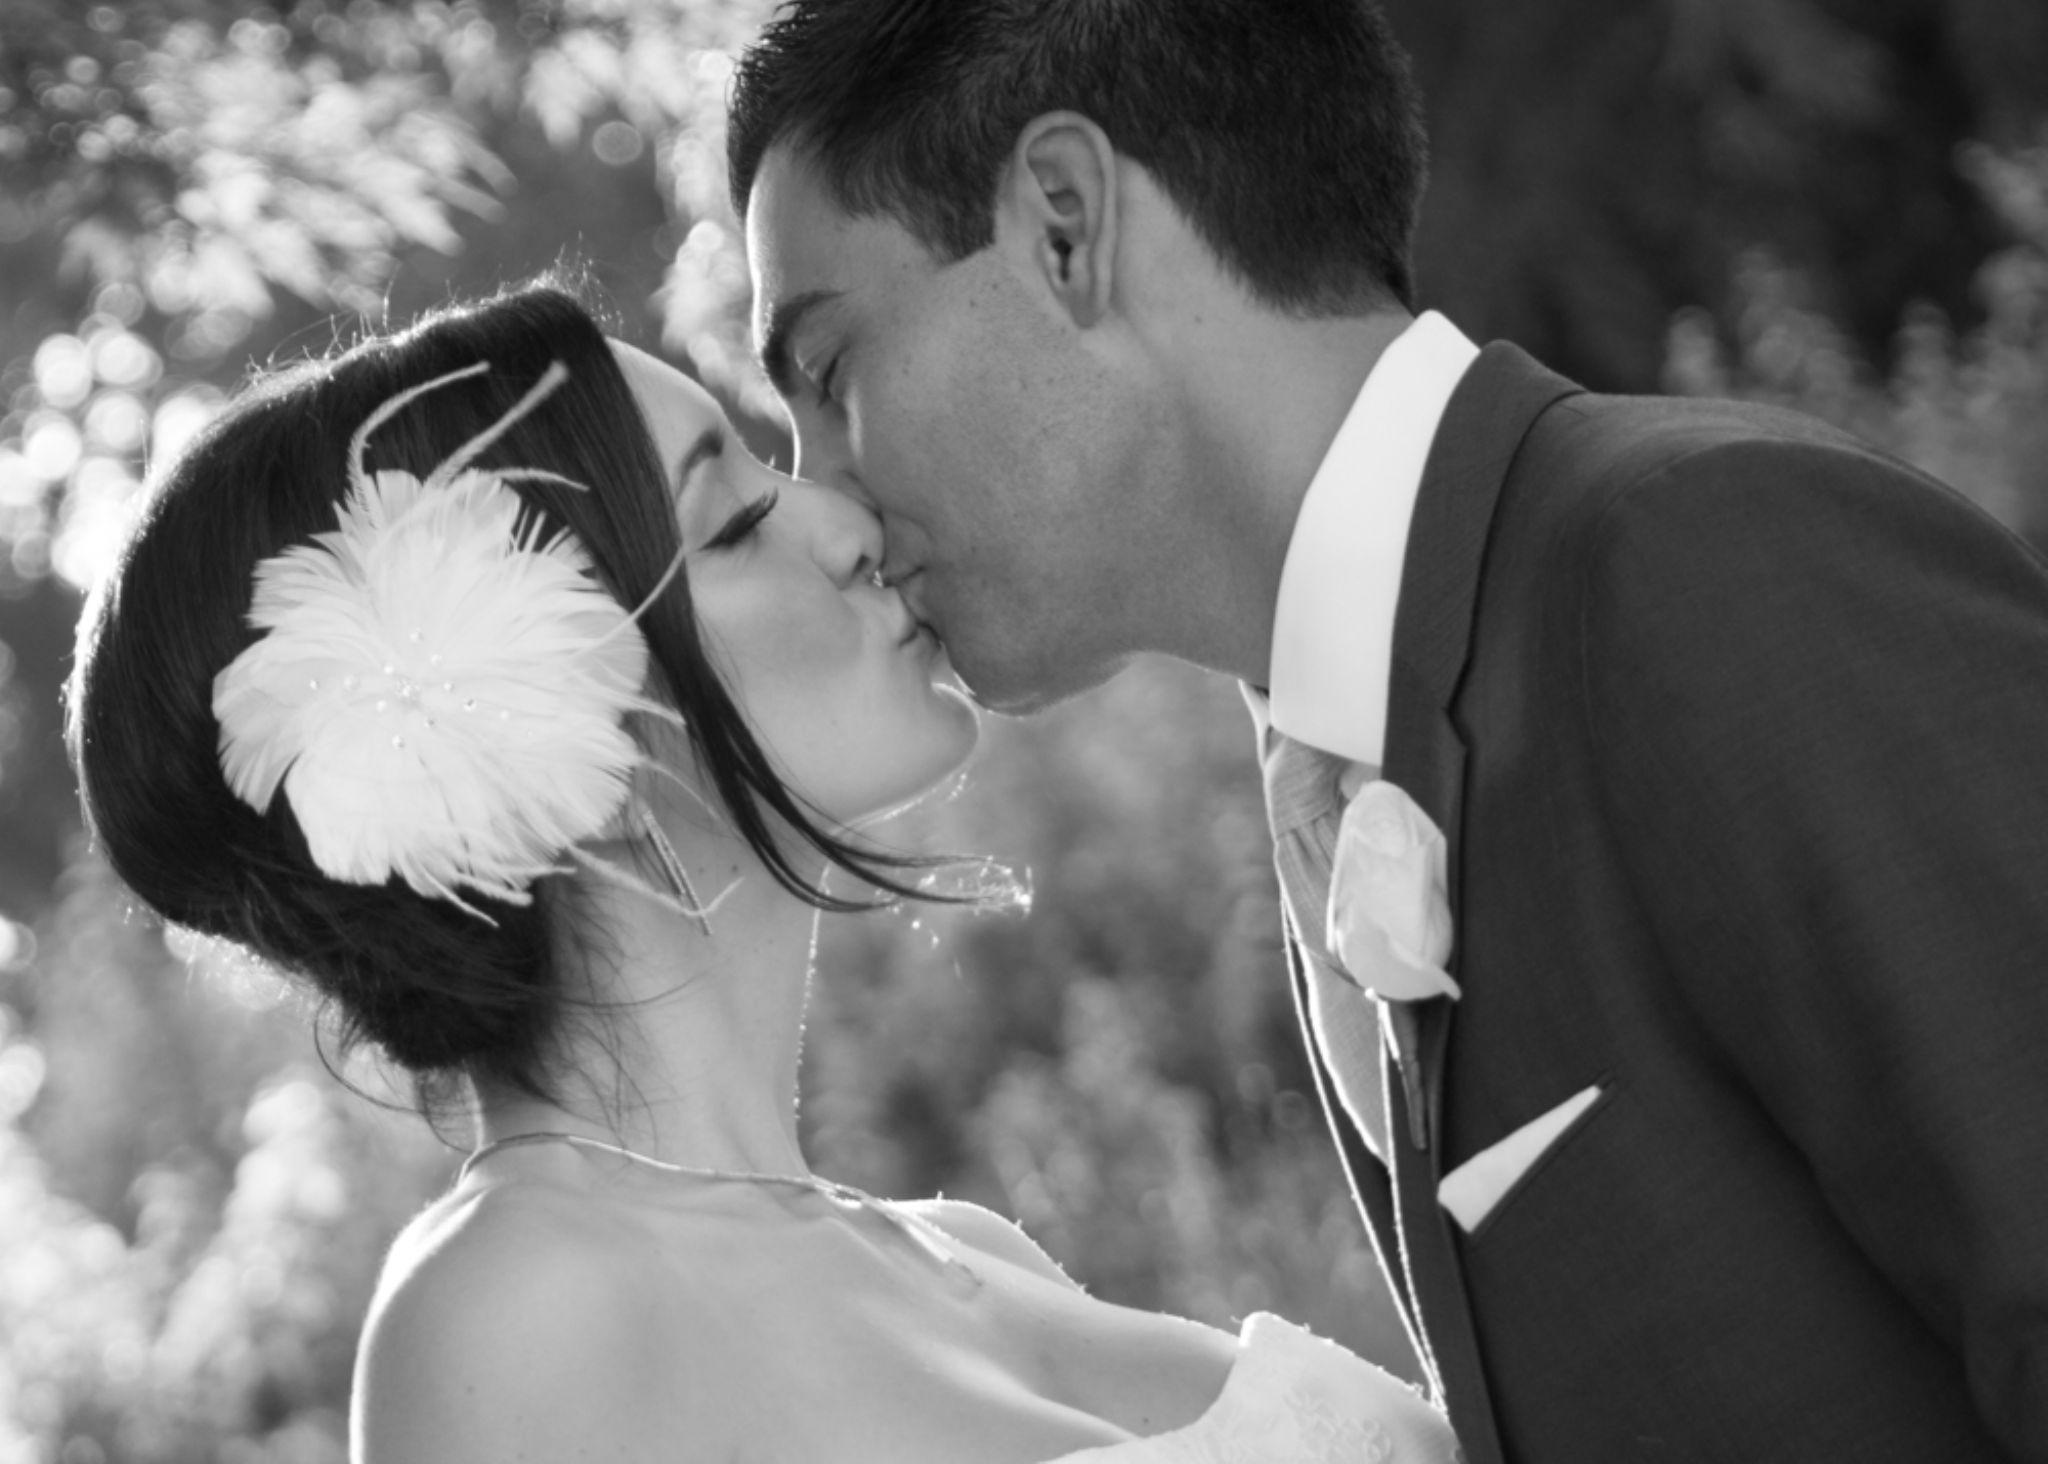 Lover's Kiss by SweetJoJoPhotography